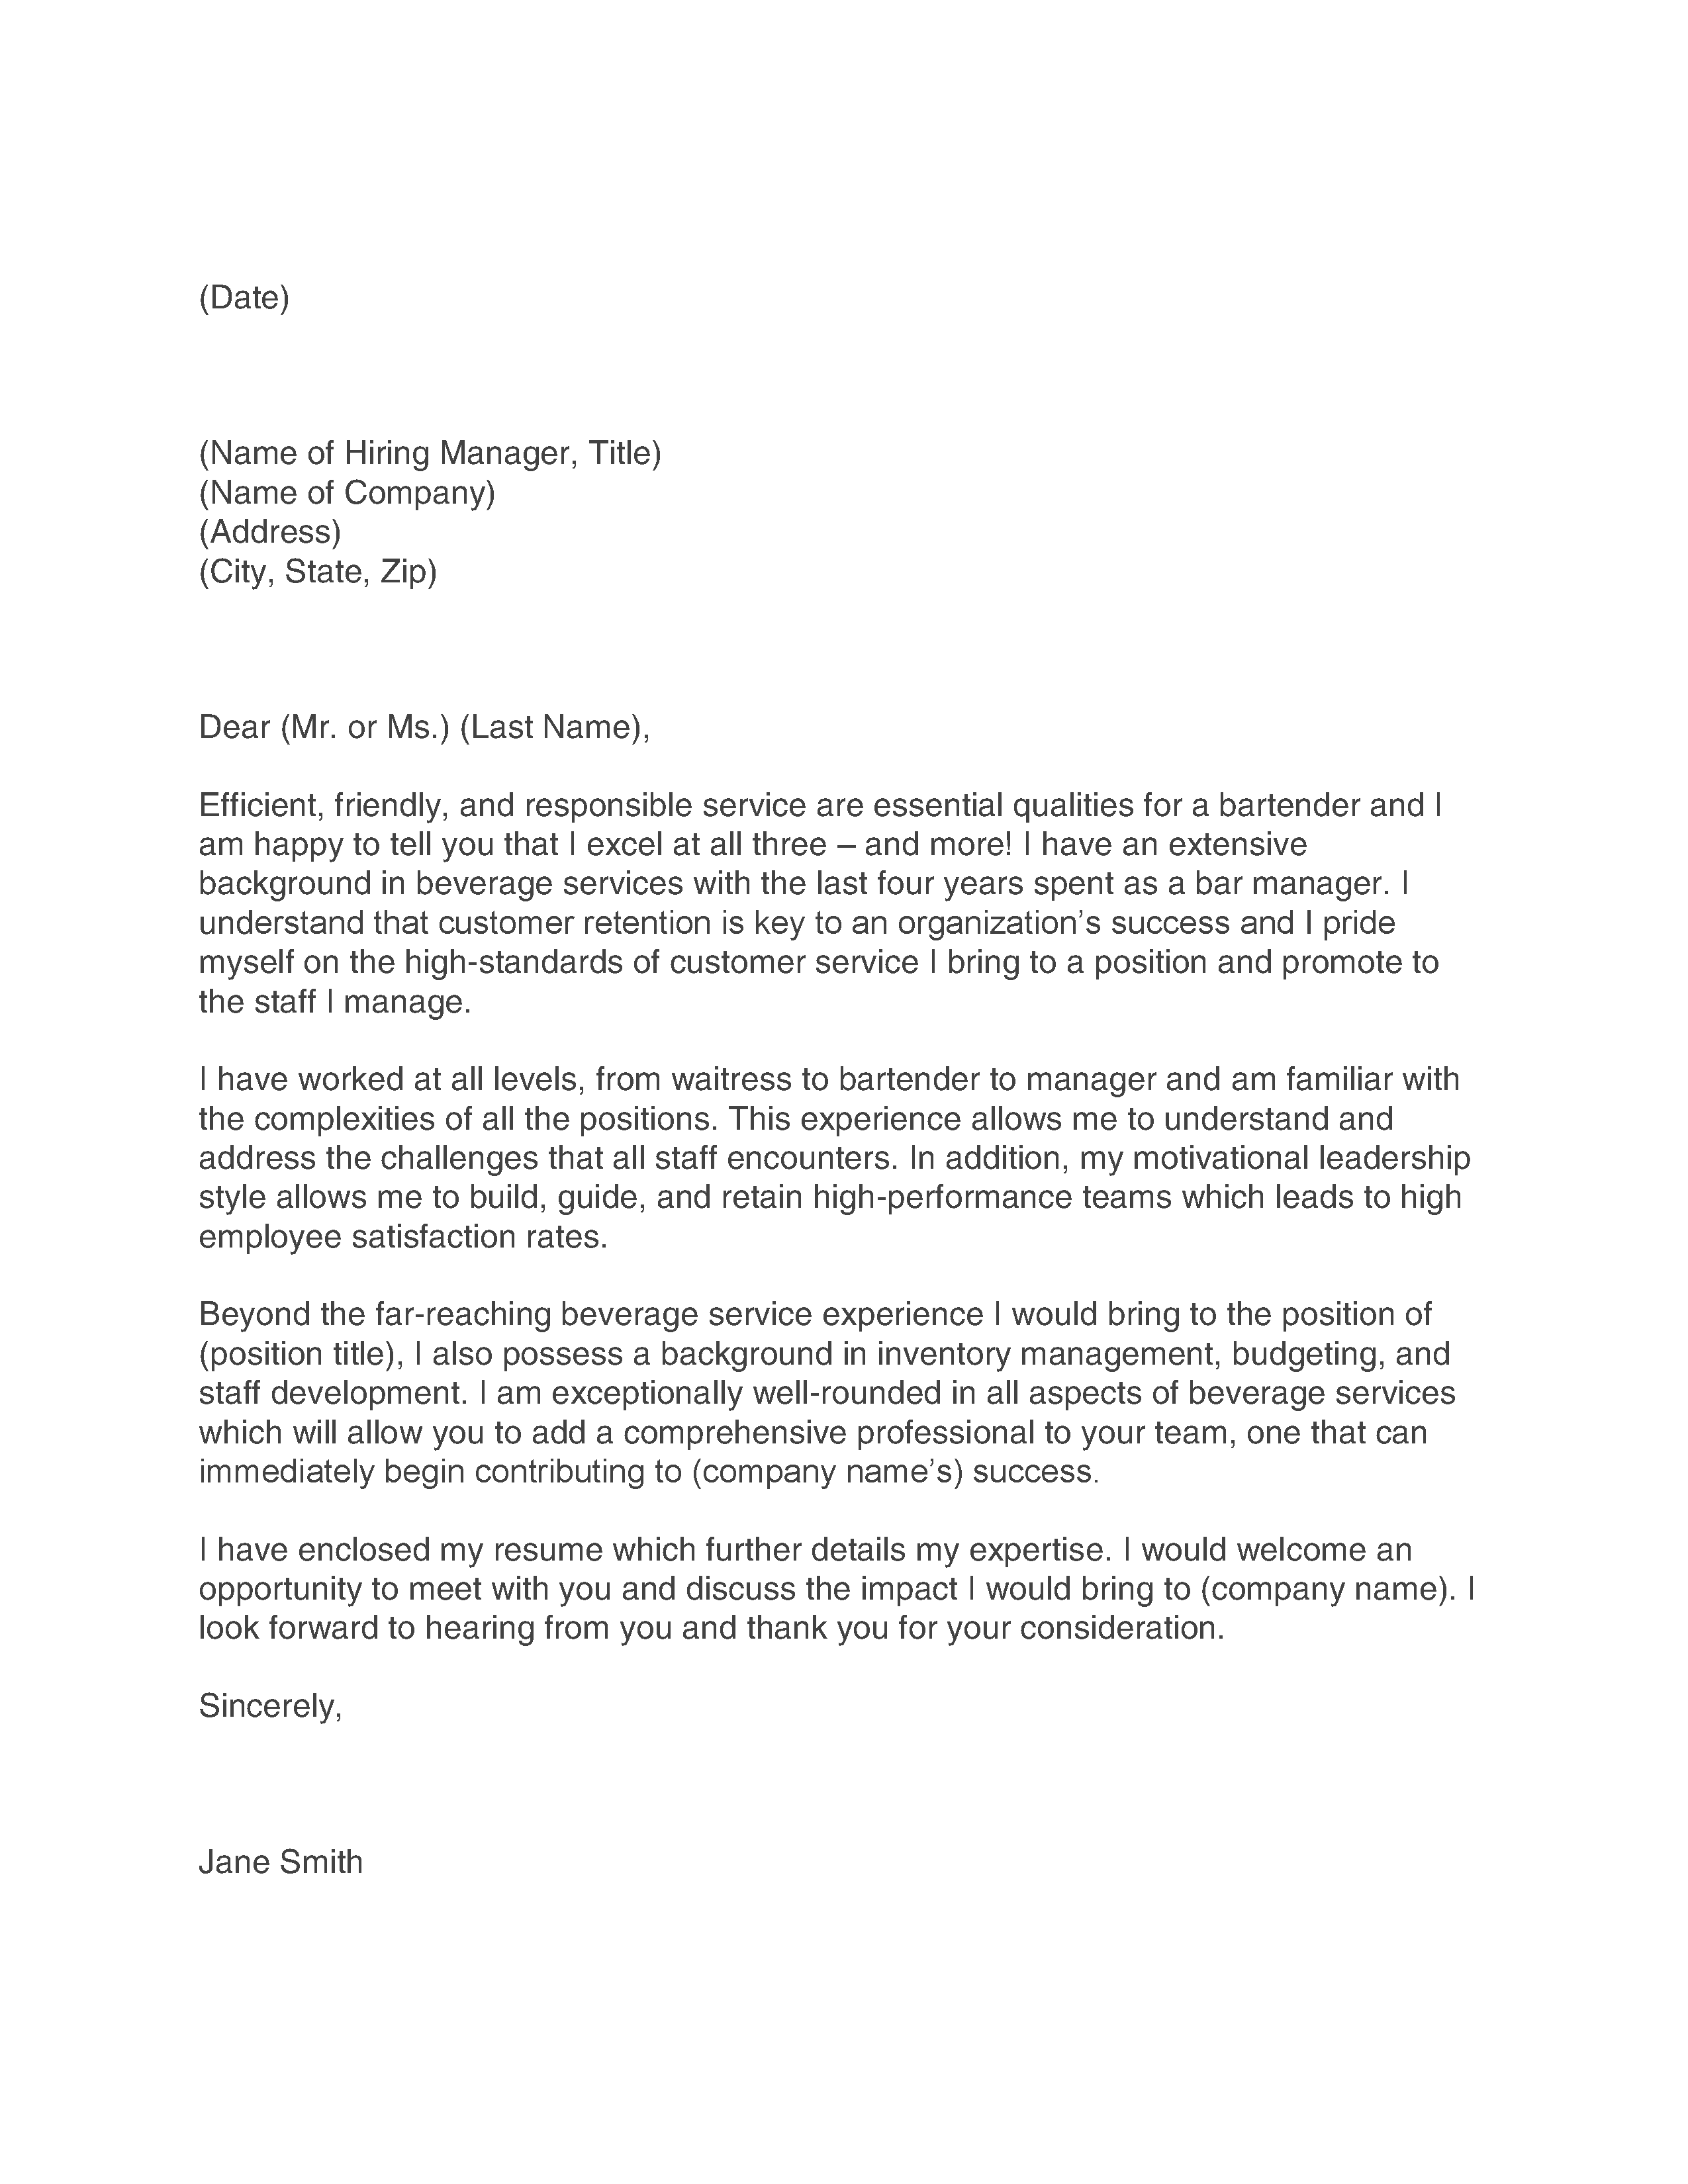 Cover letter for bartender with experience letter idea 2018 thesis phd dissertation 2017 team leadership essay virus resume templates waiter bartender madrichimfo Gallery